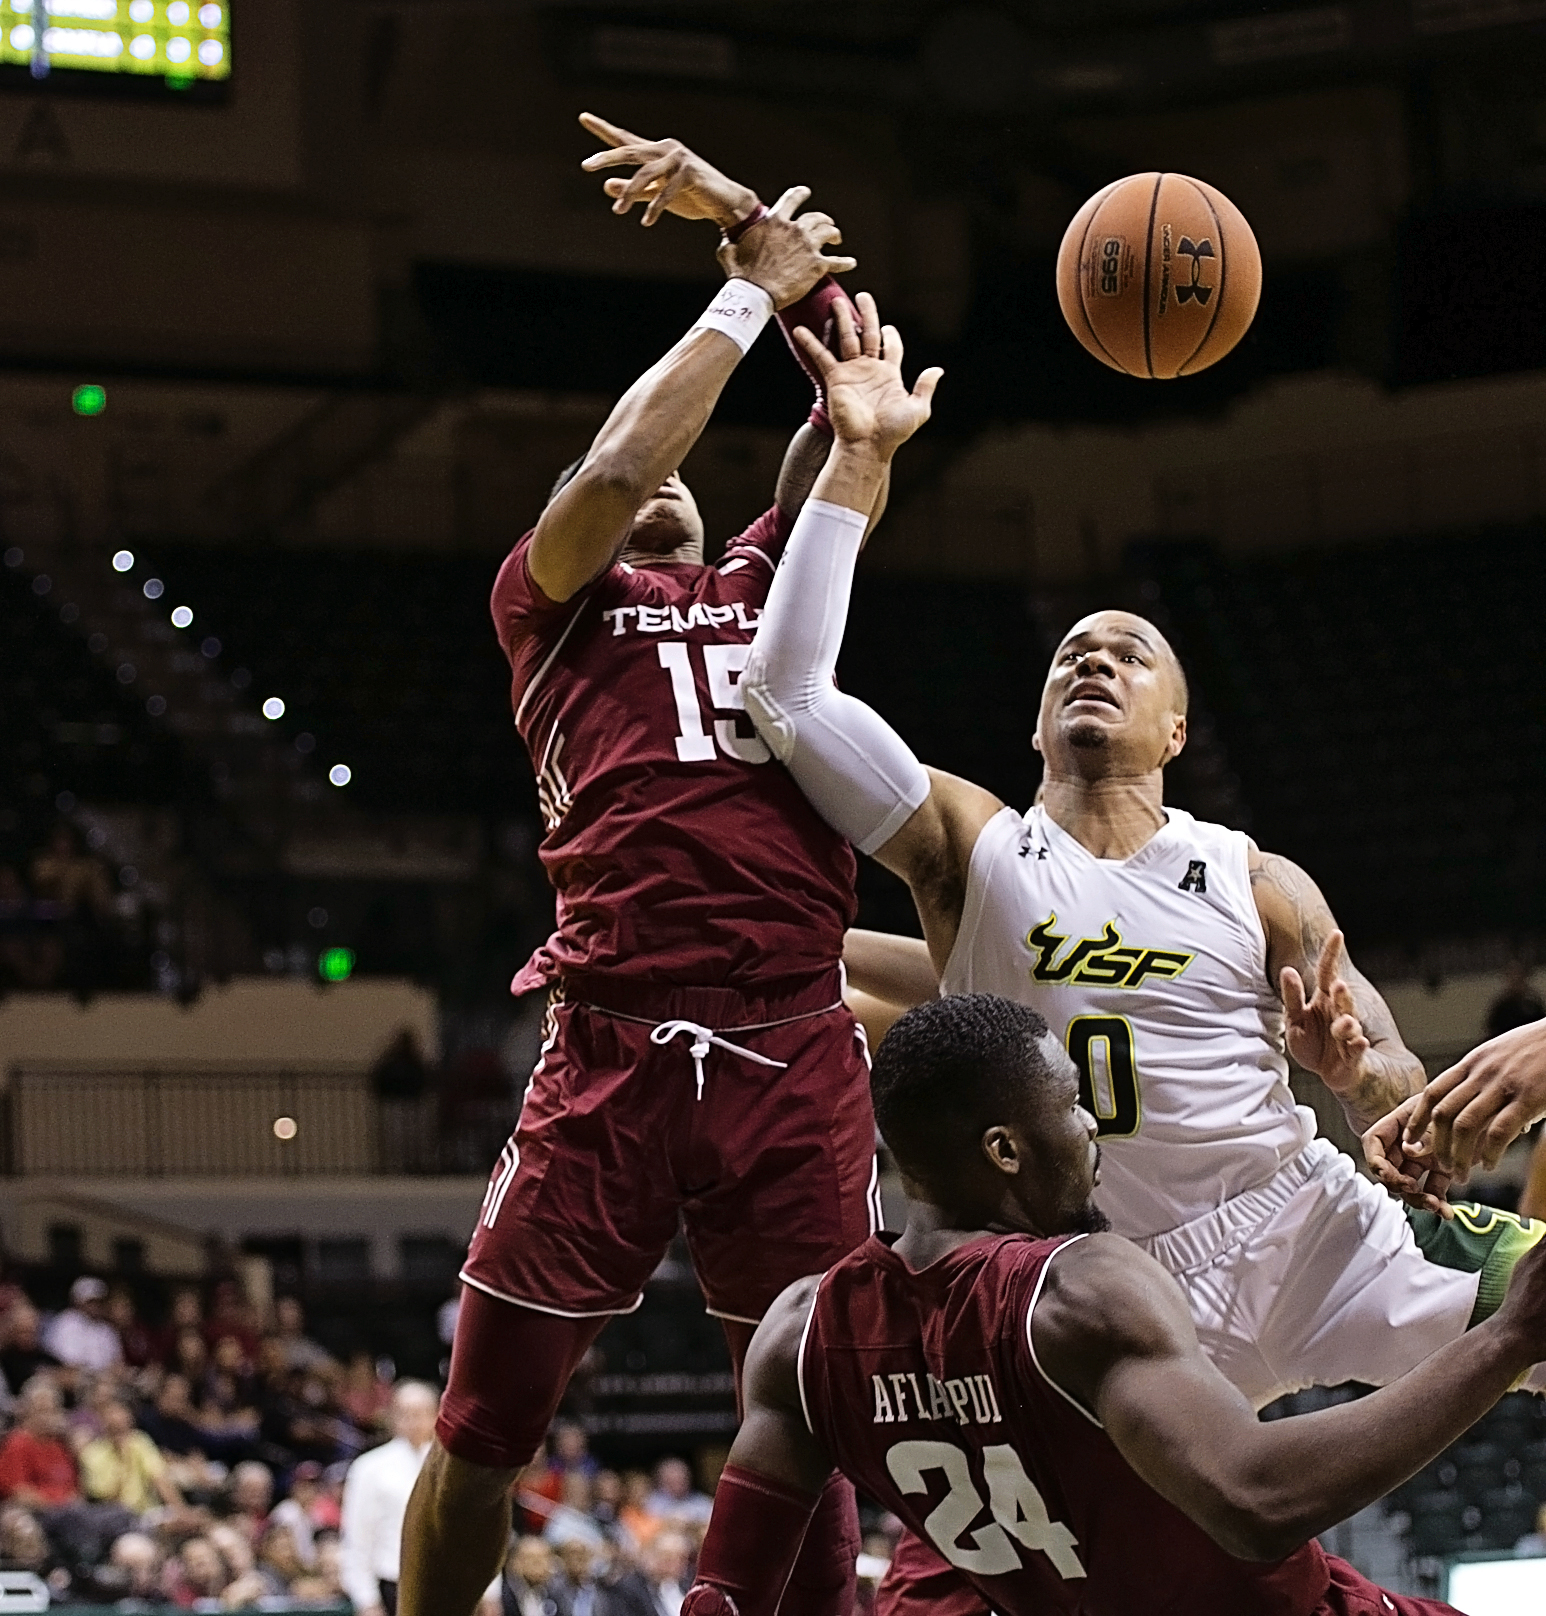 Jiggetts tries to drive to the basket./CARMEN MANDATO